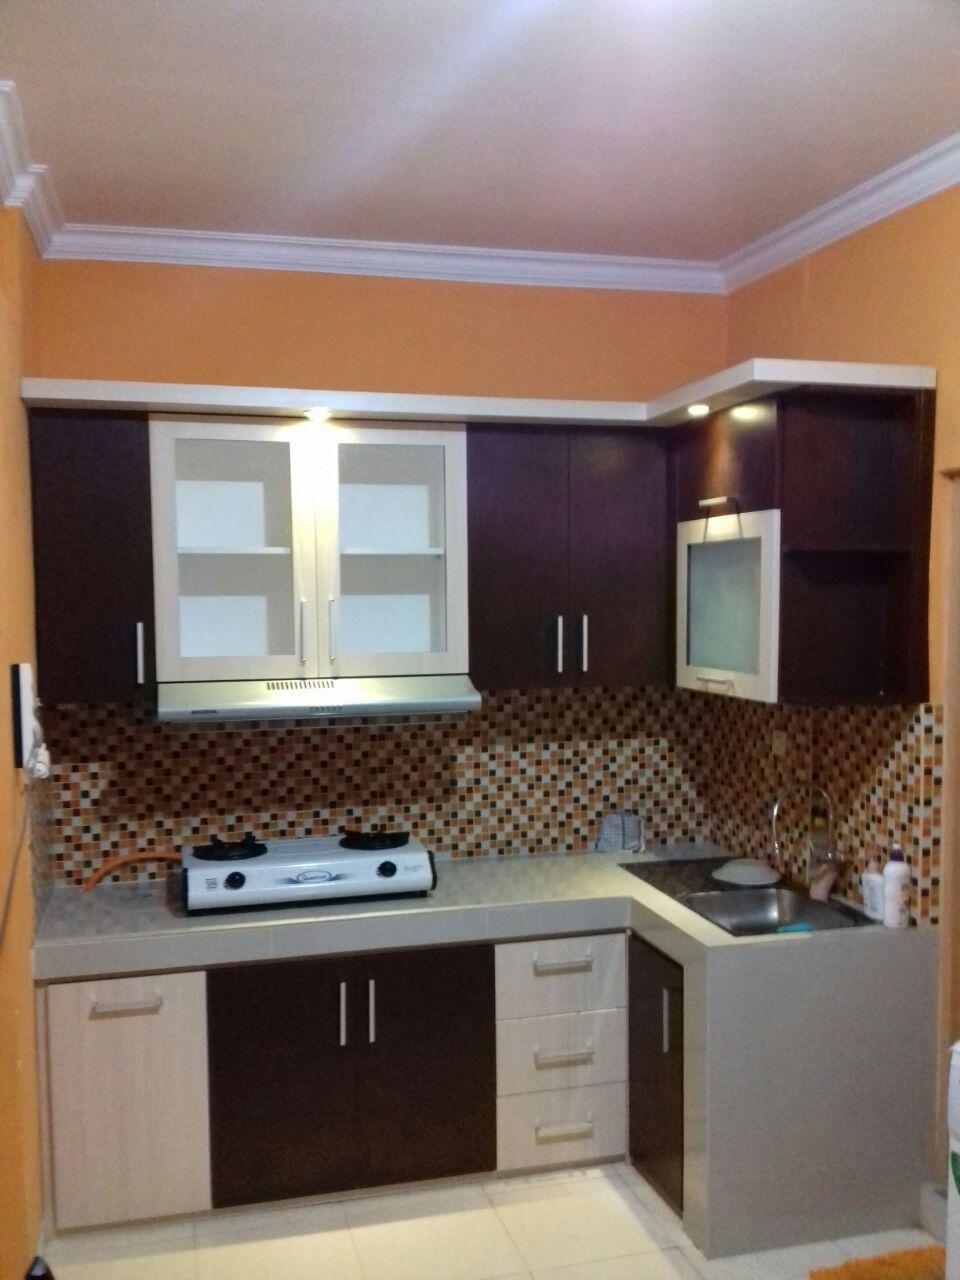 Daftar harga kitchen set murah jakarta bekasi tanggerang dan